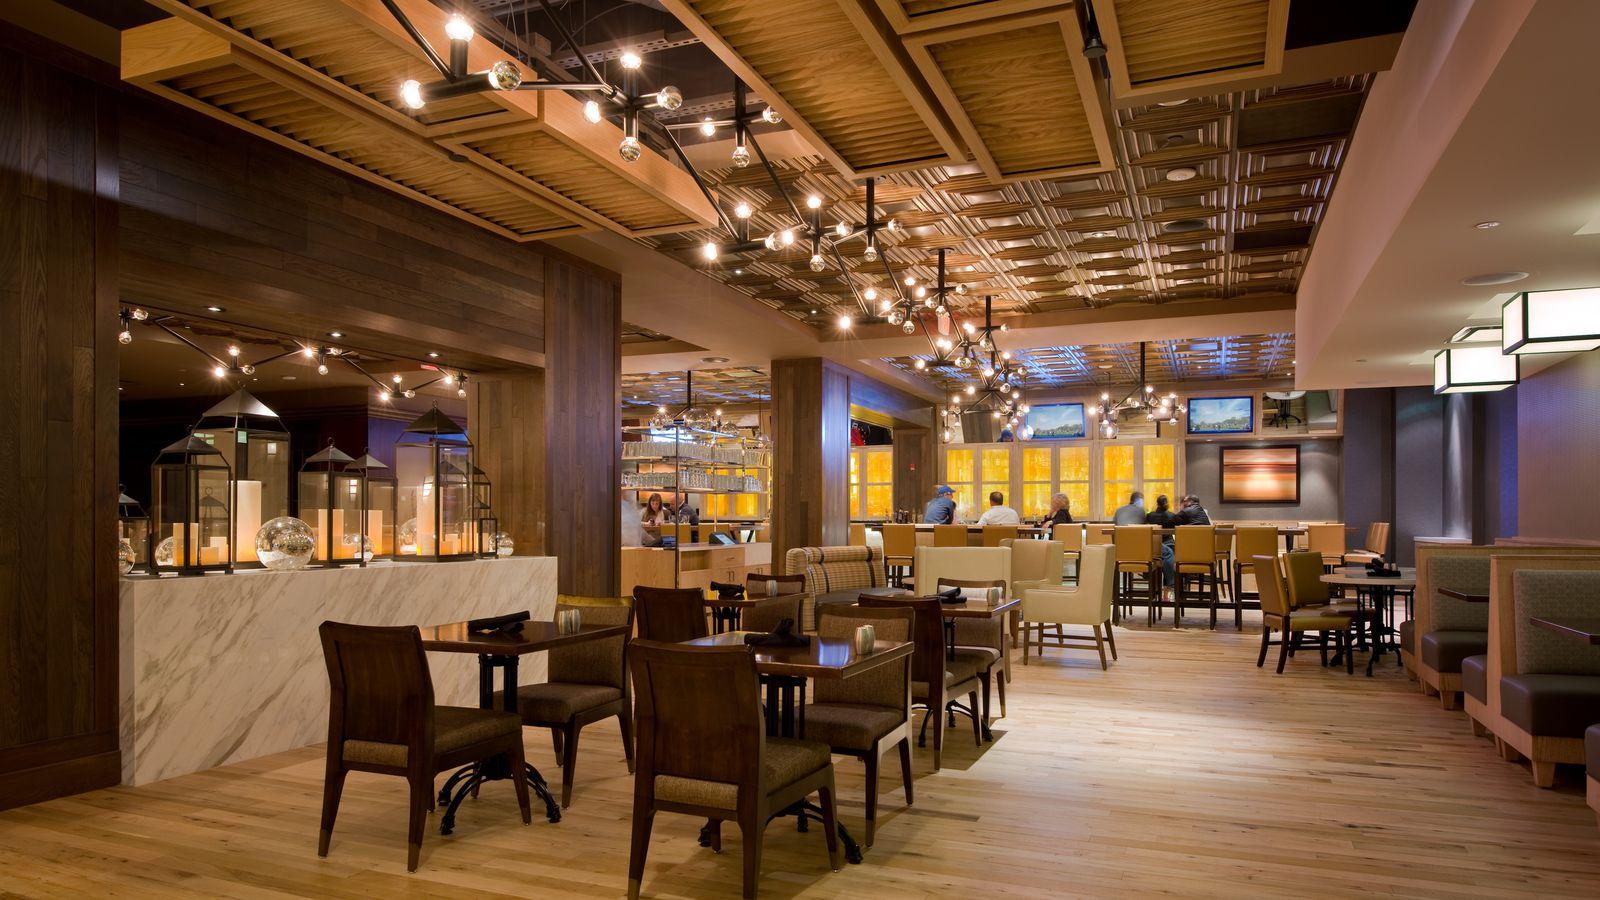 Shutters bar kitchen opens in tysons marriott eater dc